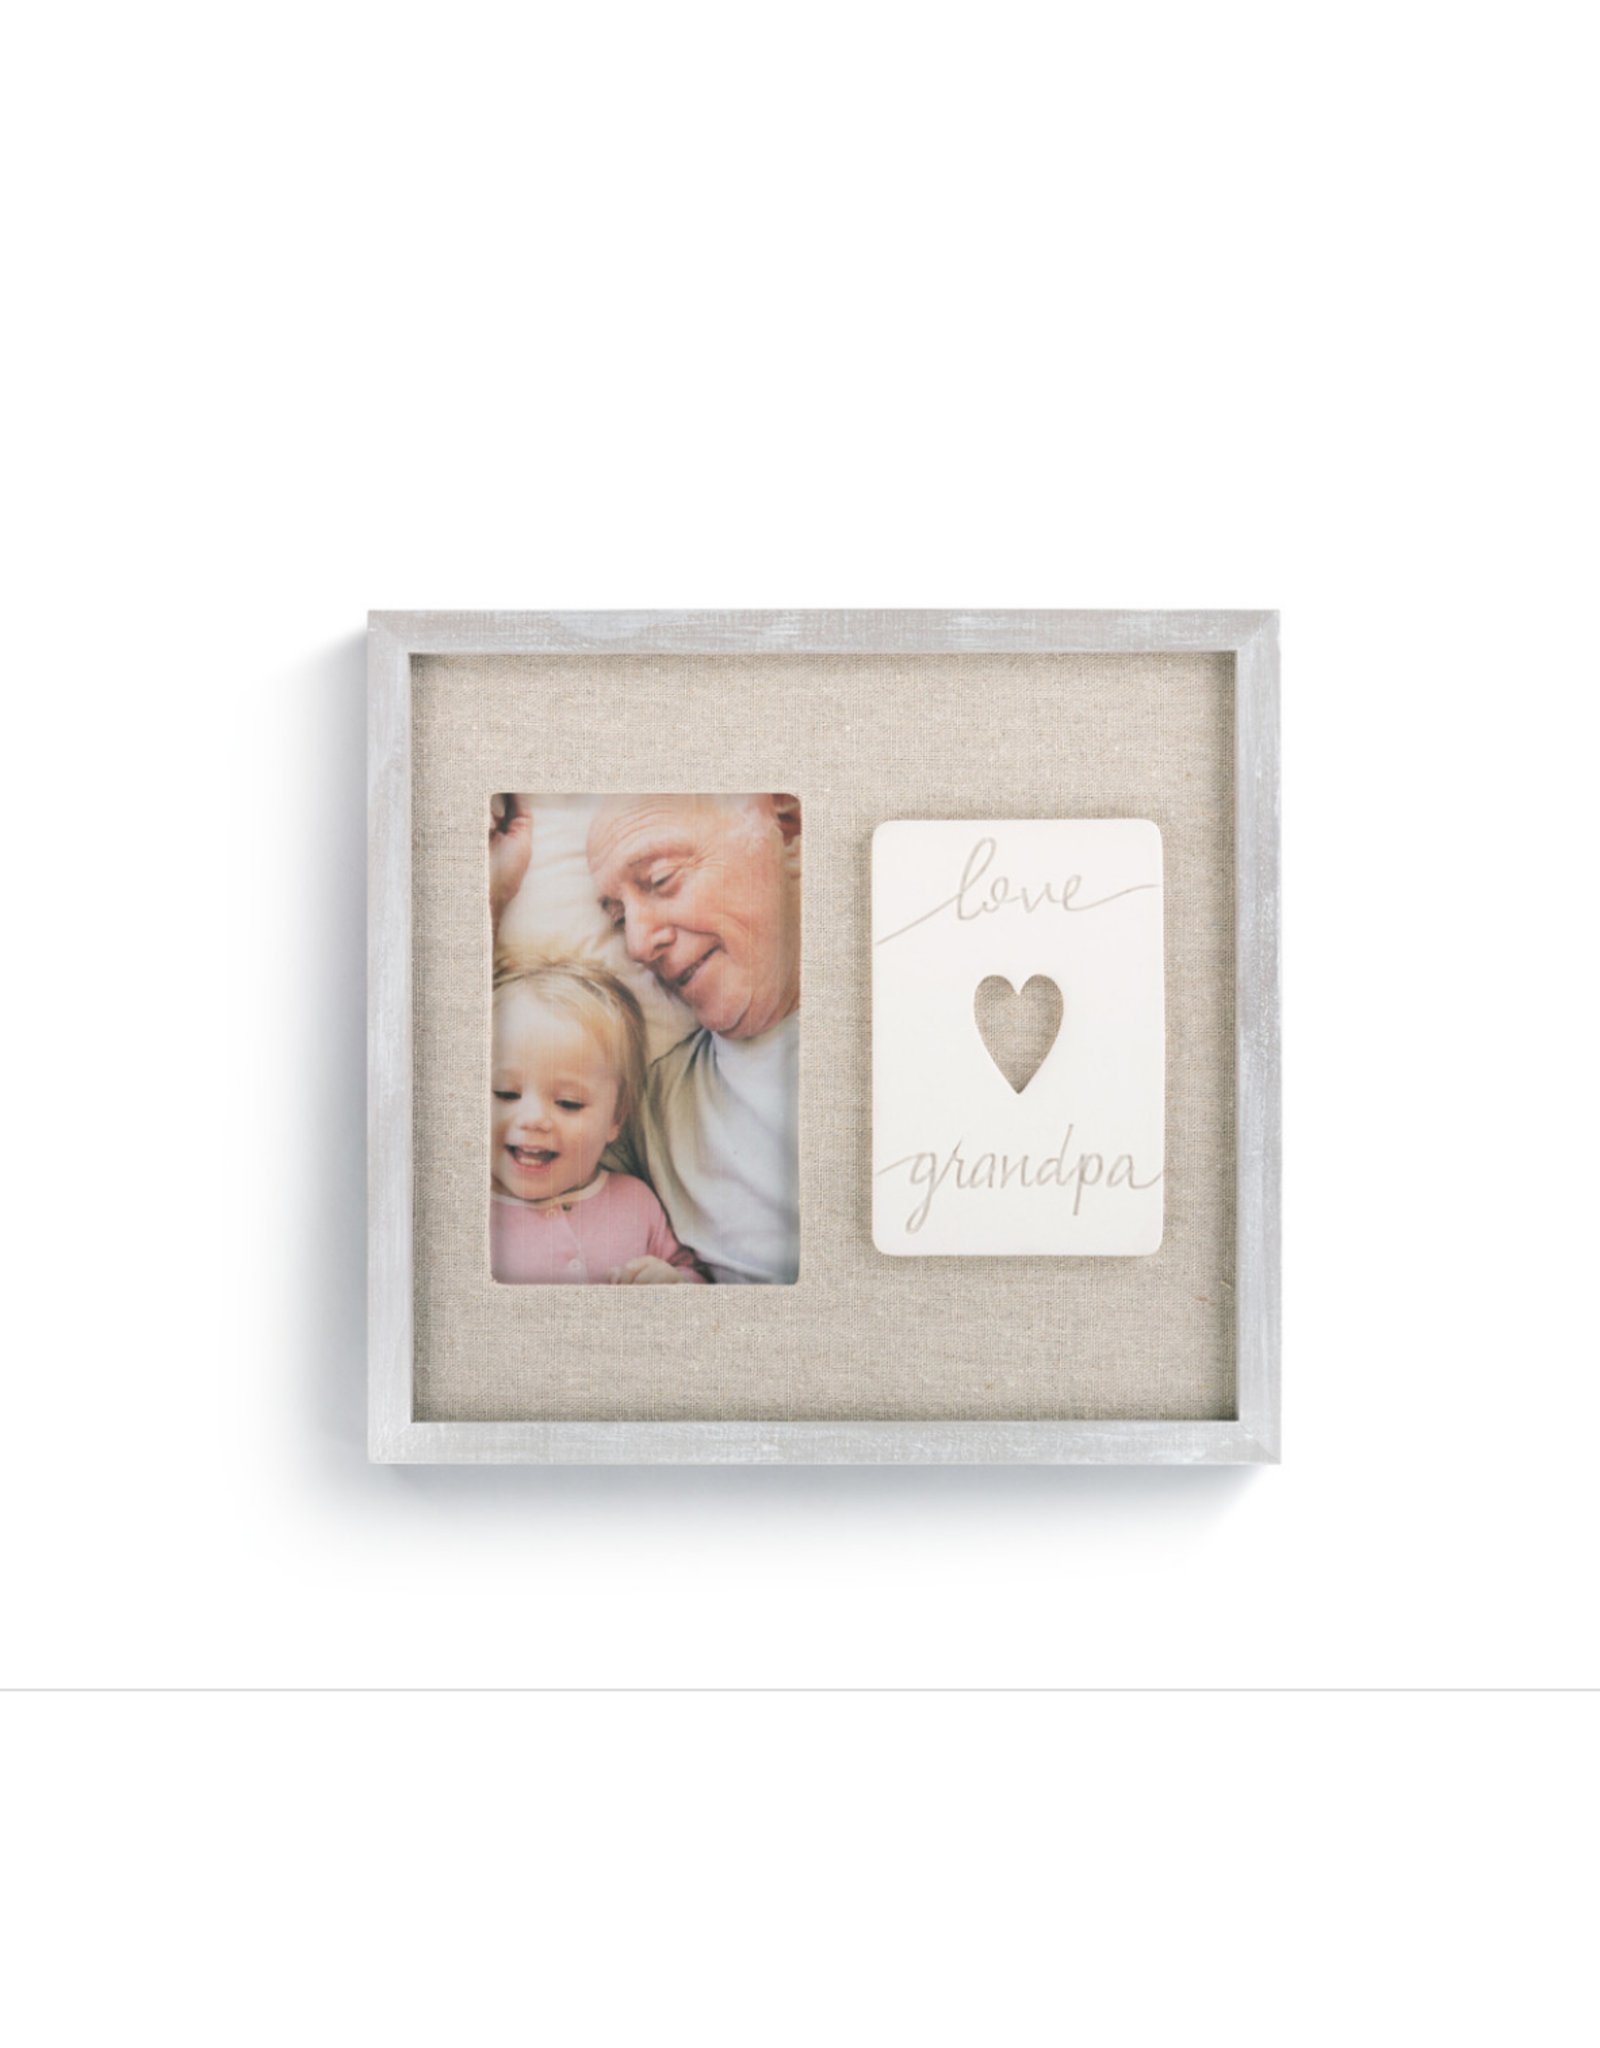 Love Grandma Frame